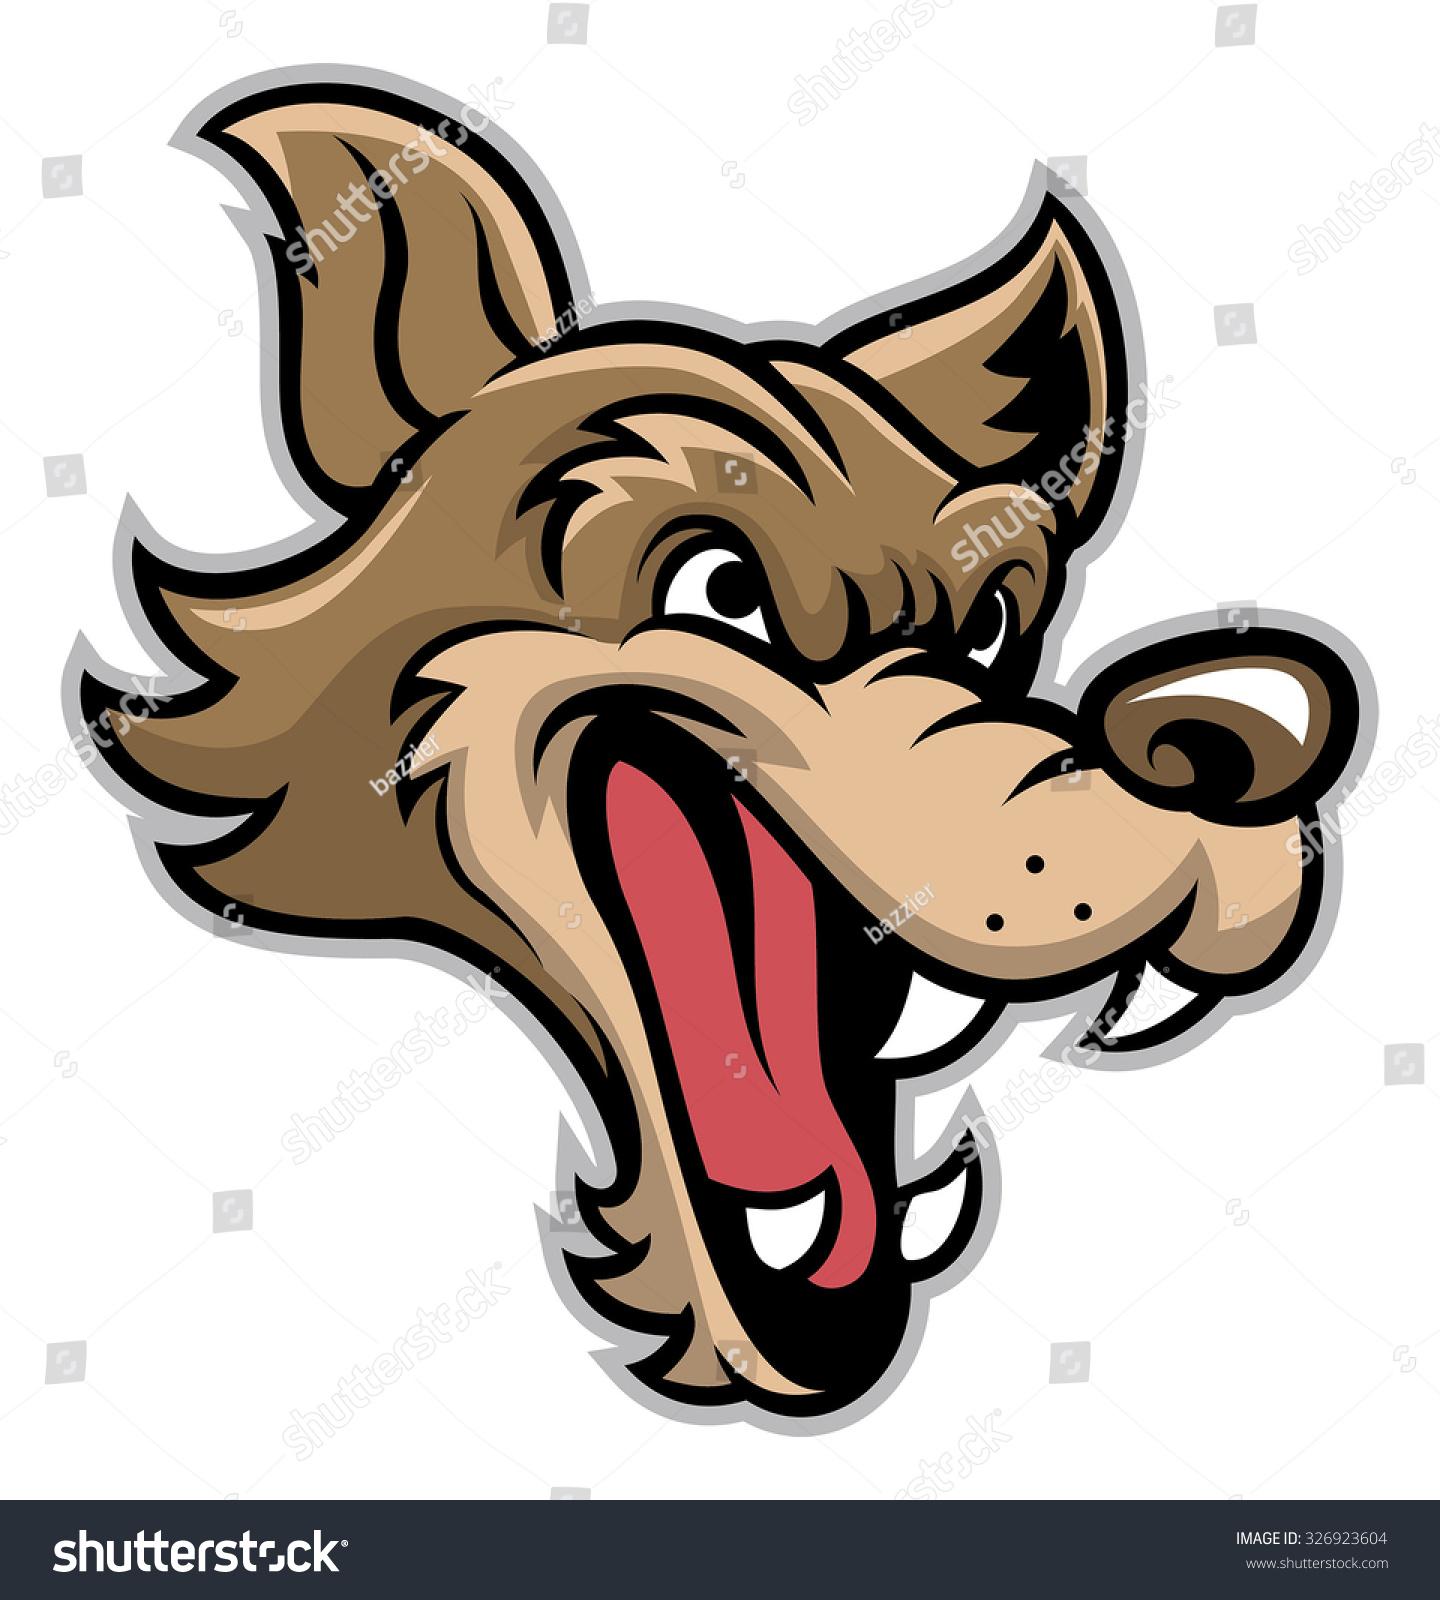 how to draw a cartoon wolf head